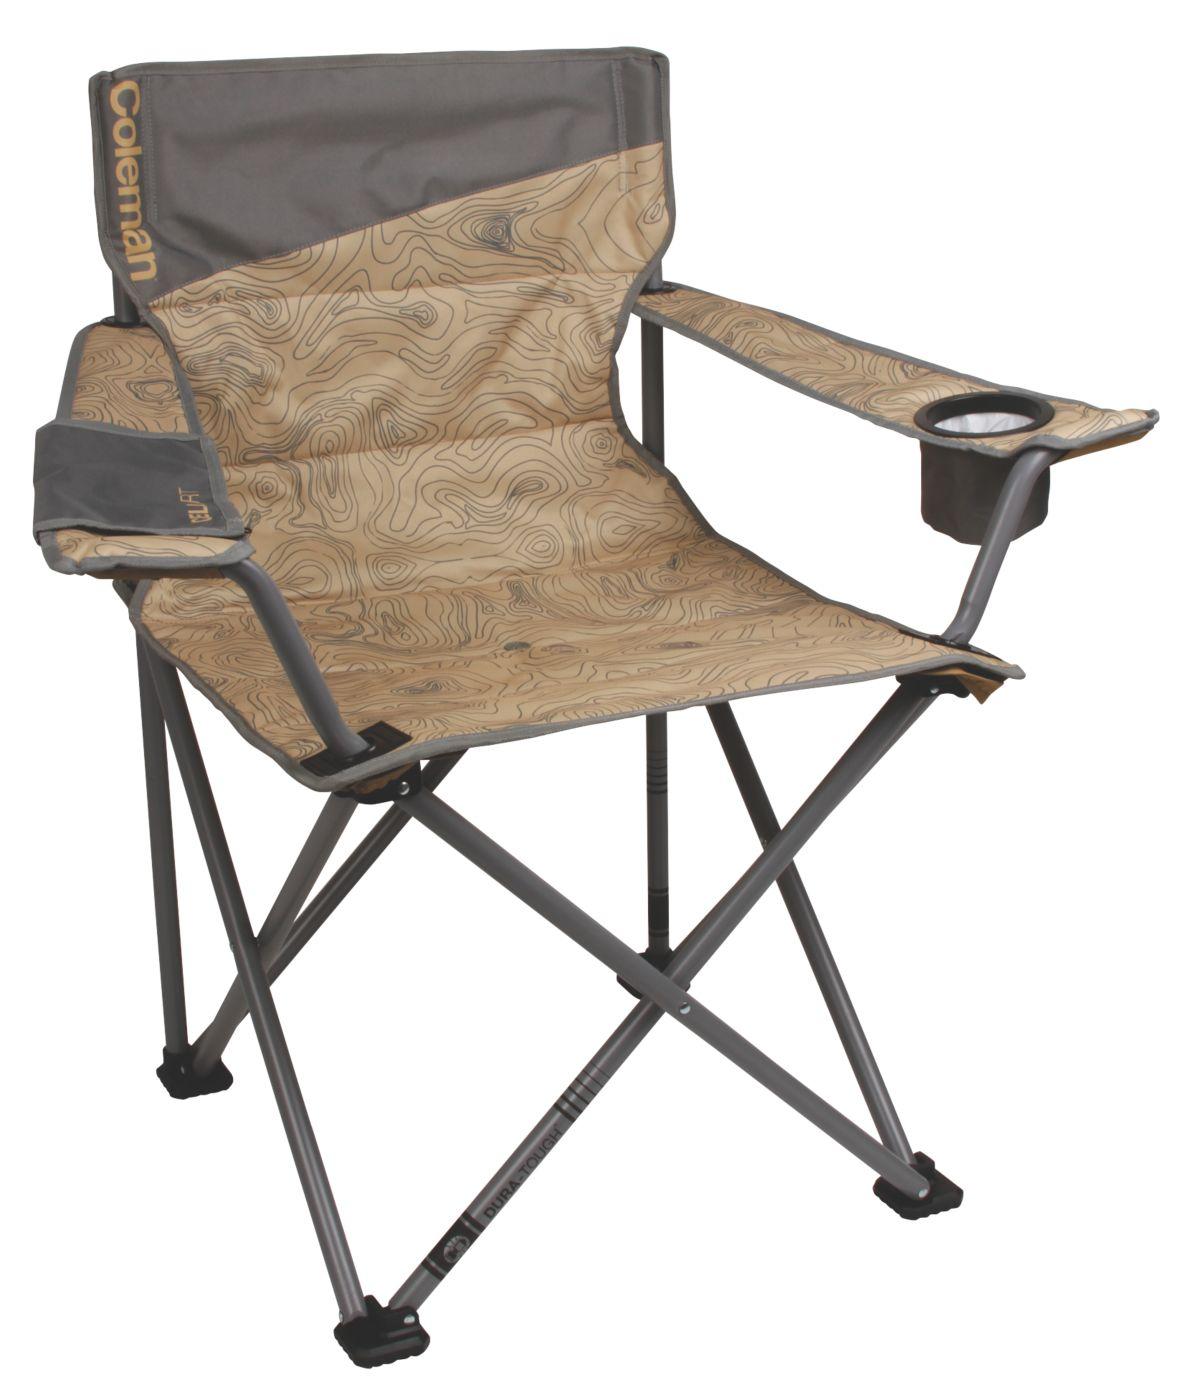 Big-N-Tall™ Quad Chair  sc 1 st  Coleman & Camping u0026 Folding Chairs | Coleman